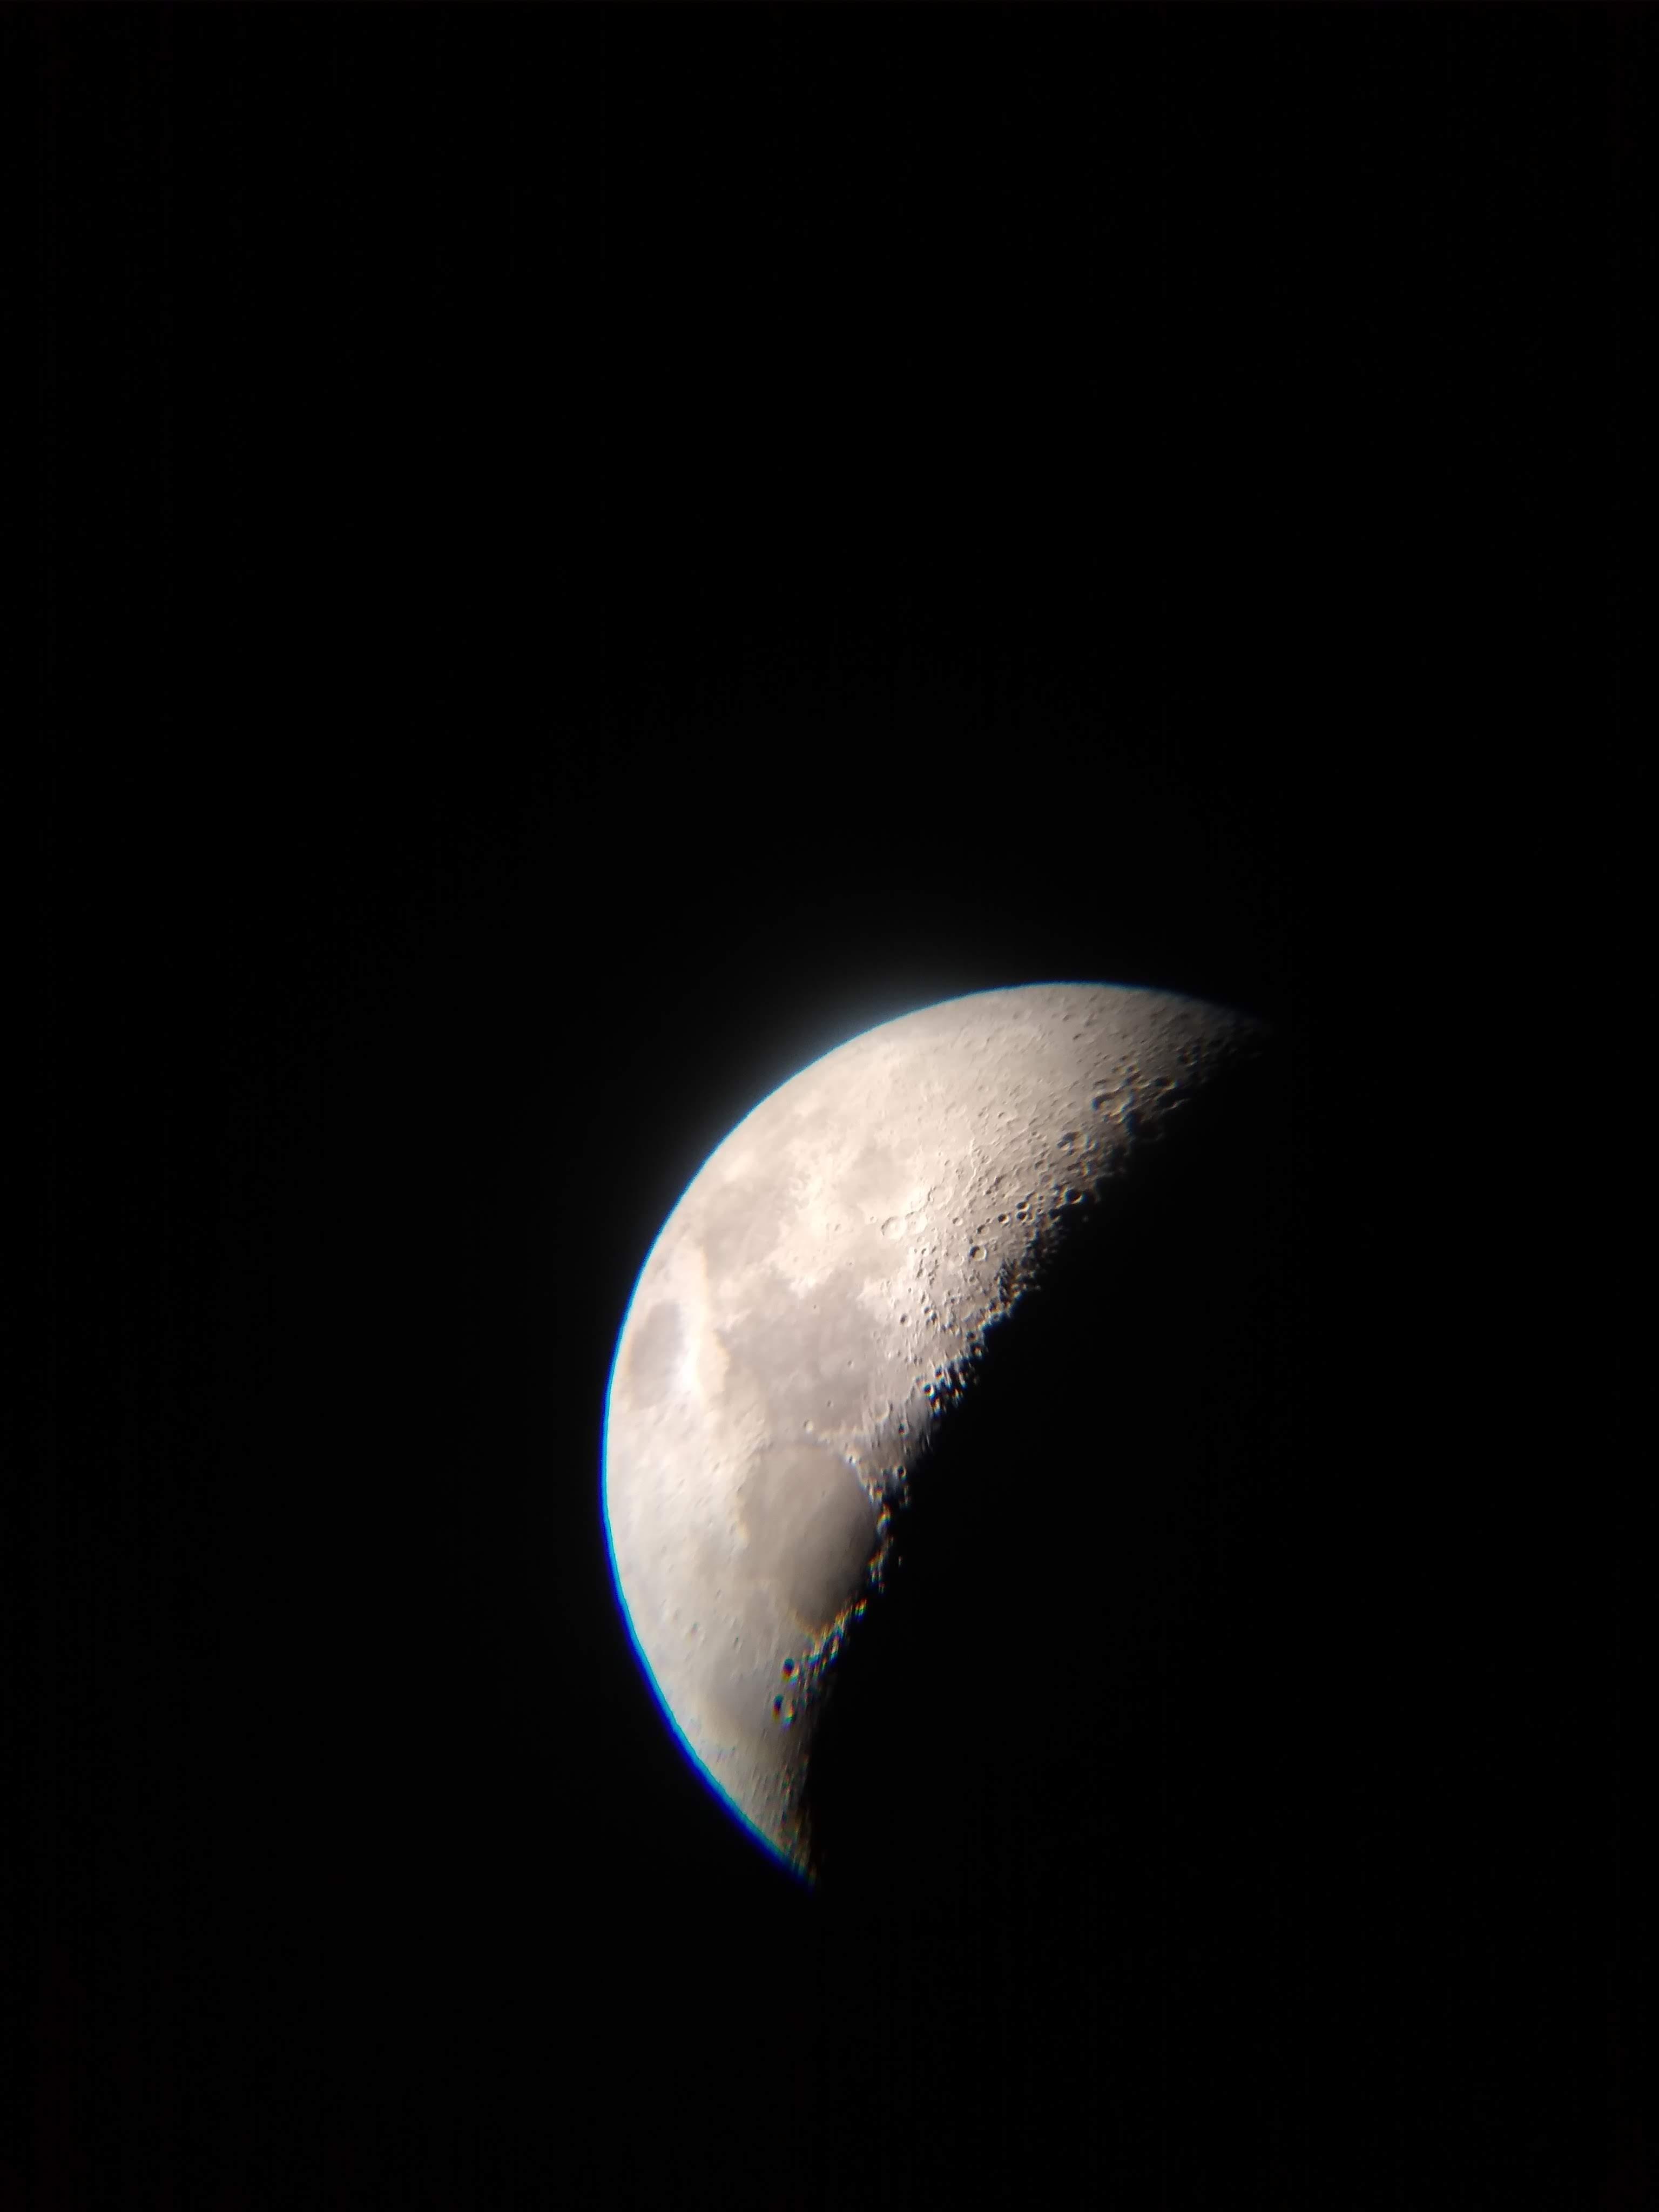 Quarter moon picture taken through a telescope